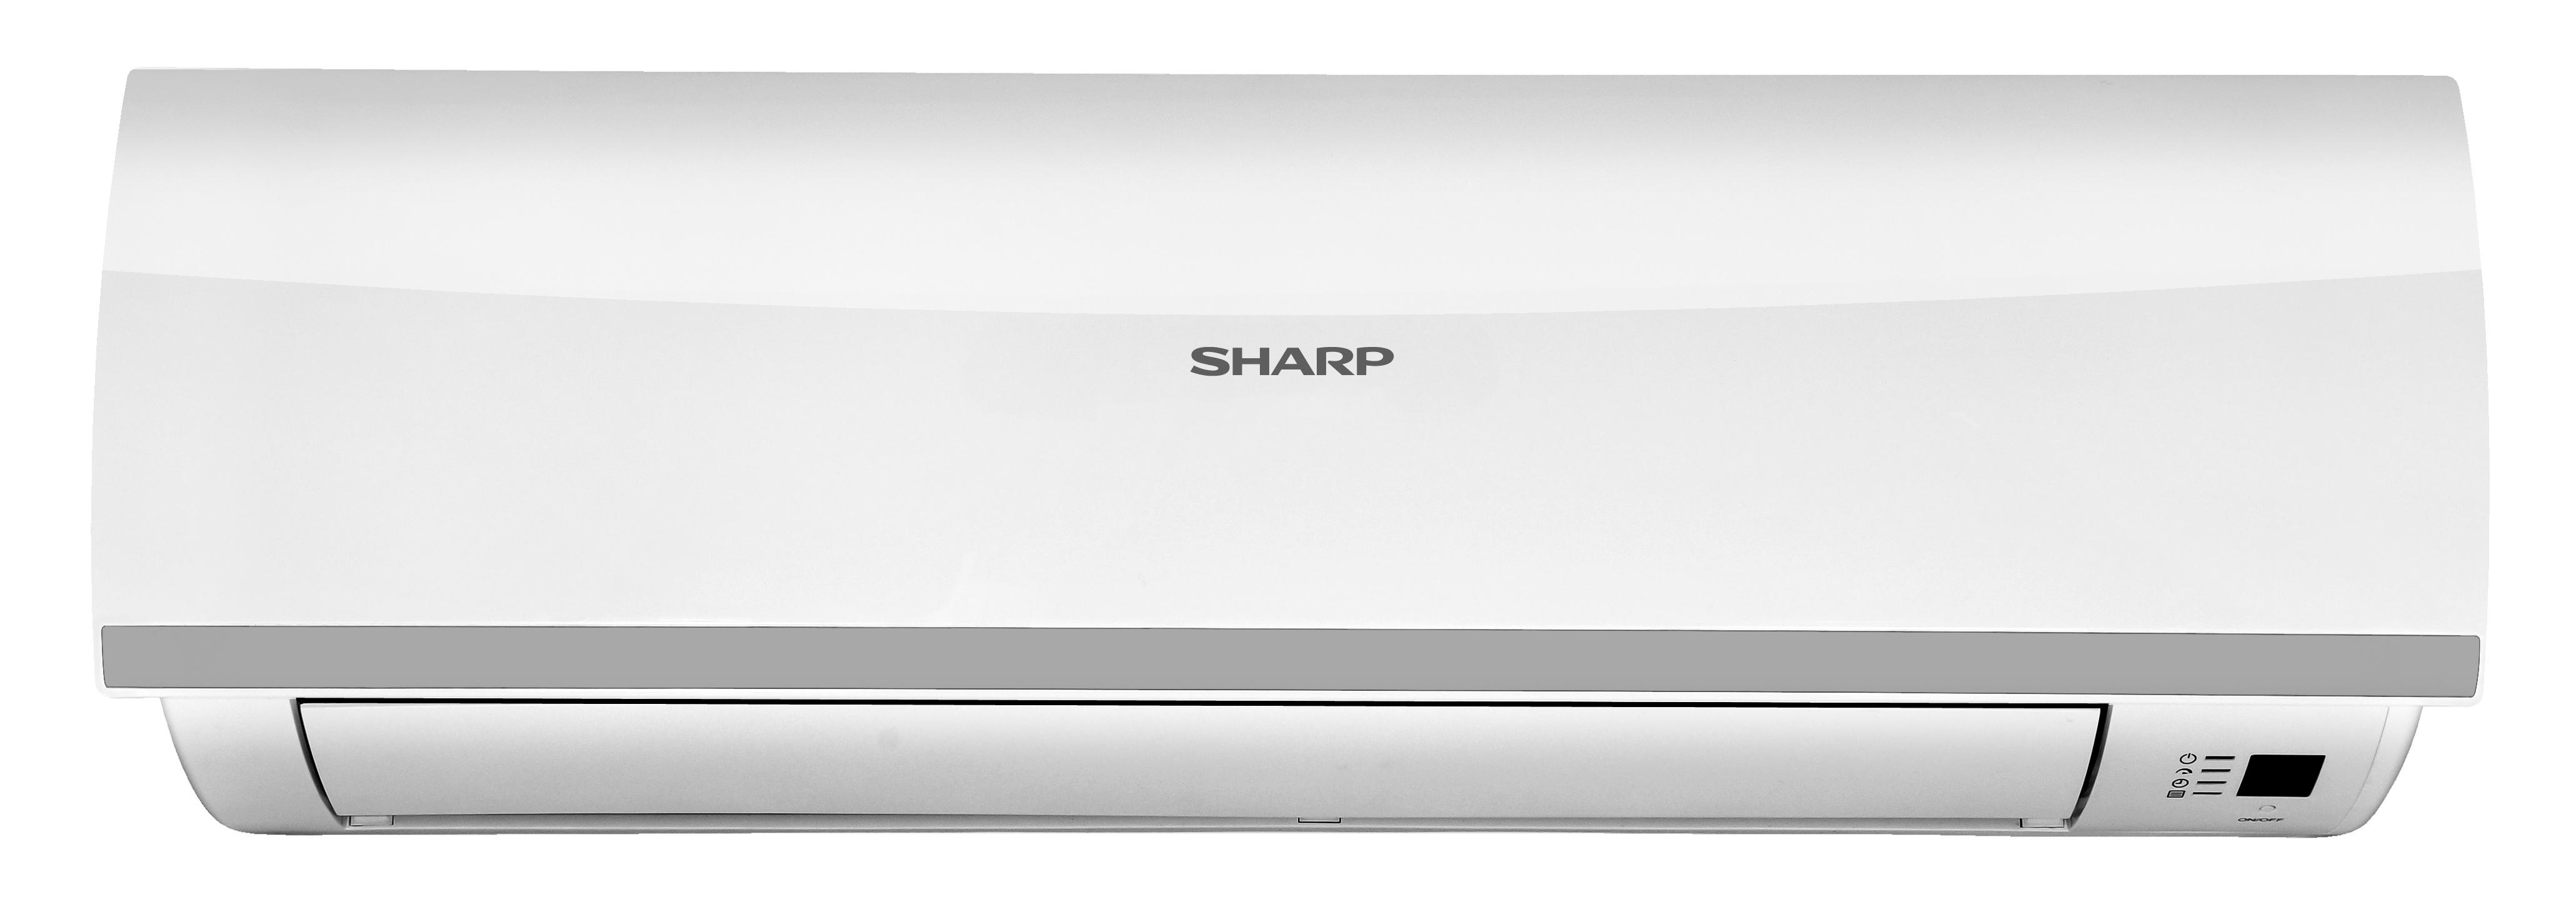 Aer conditionat Aparat Aer Conditionat Sharp AY-X12PSR 12000 BTU INVERTER